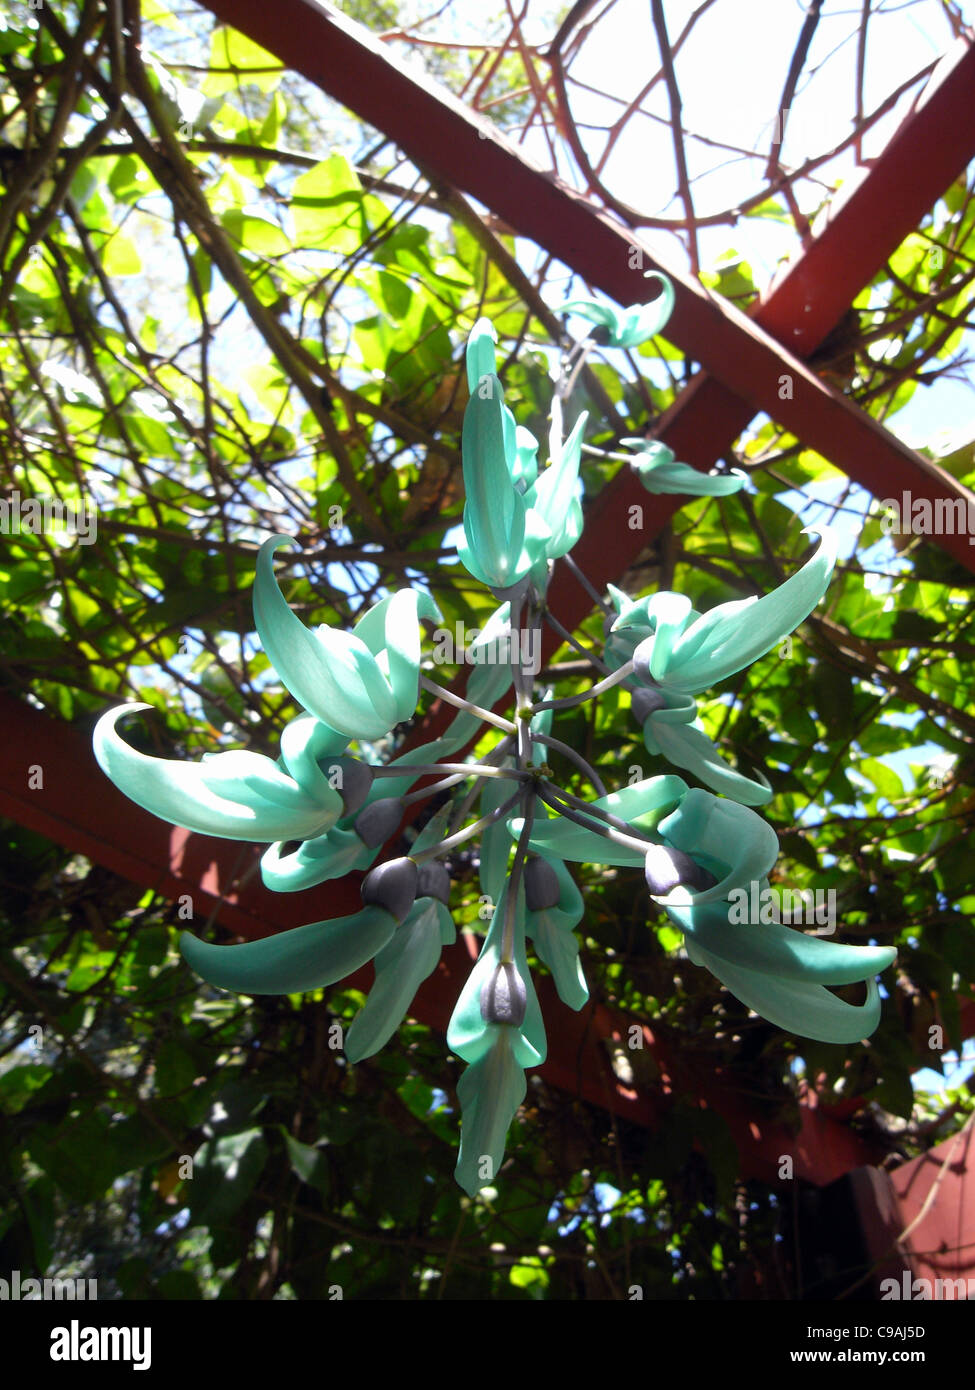 Flowering Jade Vine (Strongylodon macrobotrys) on overhead trellis at Flecker Botanic Gardens, Cairns, Queensland, - Stock Image